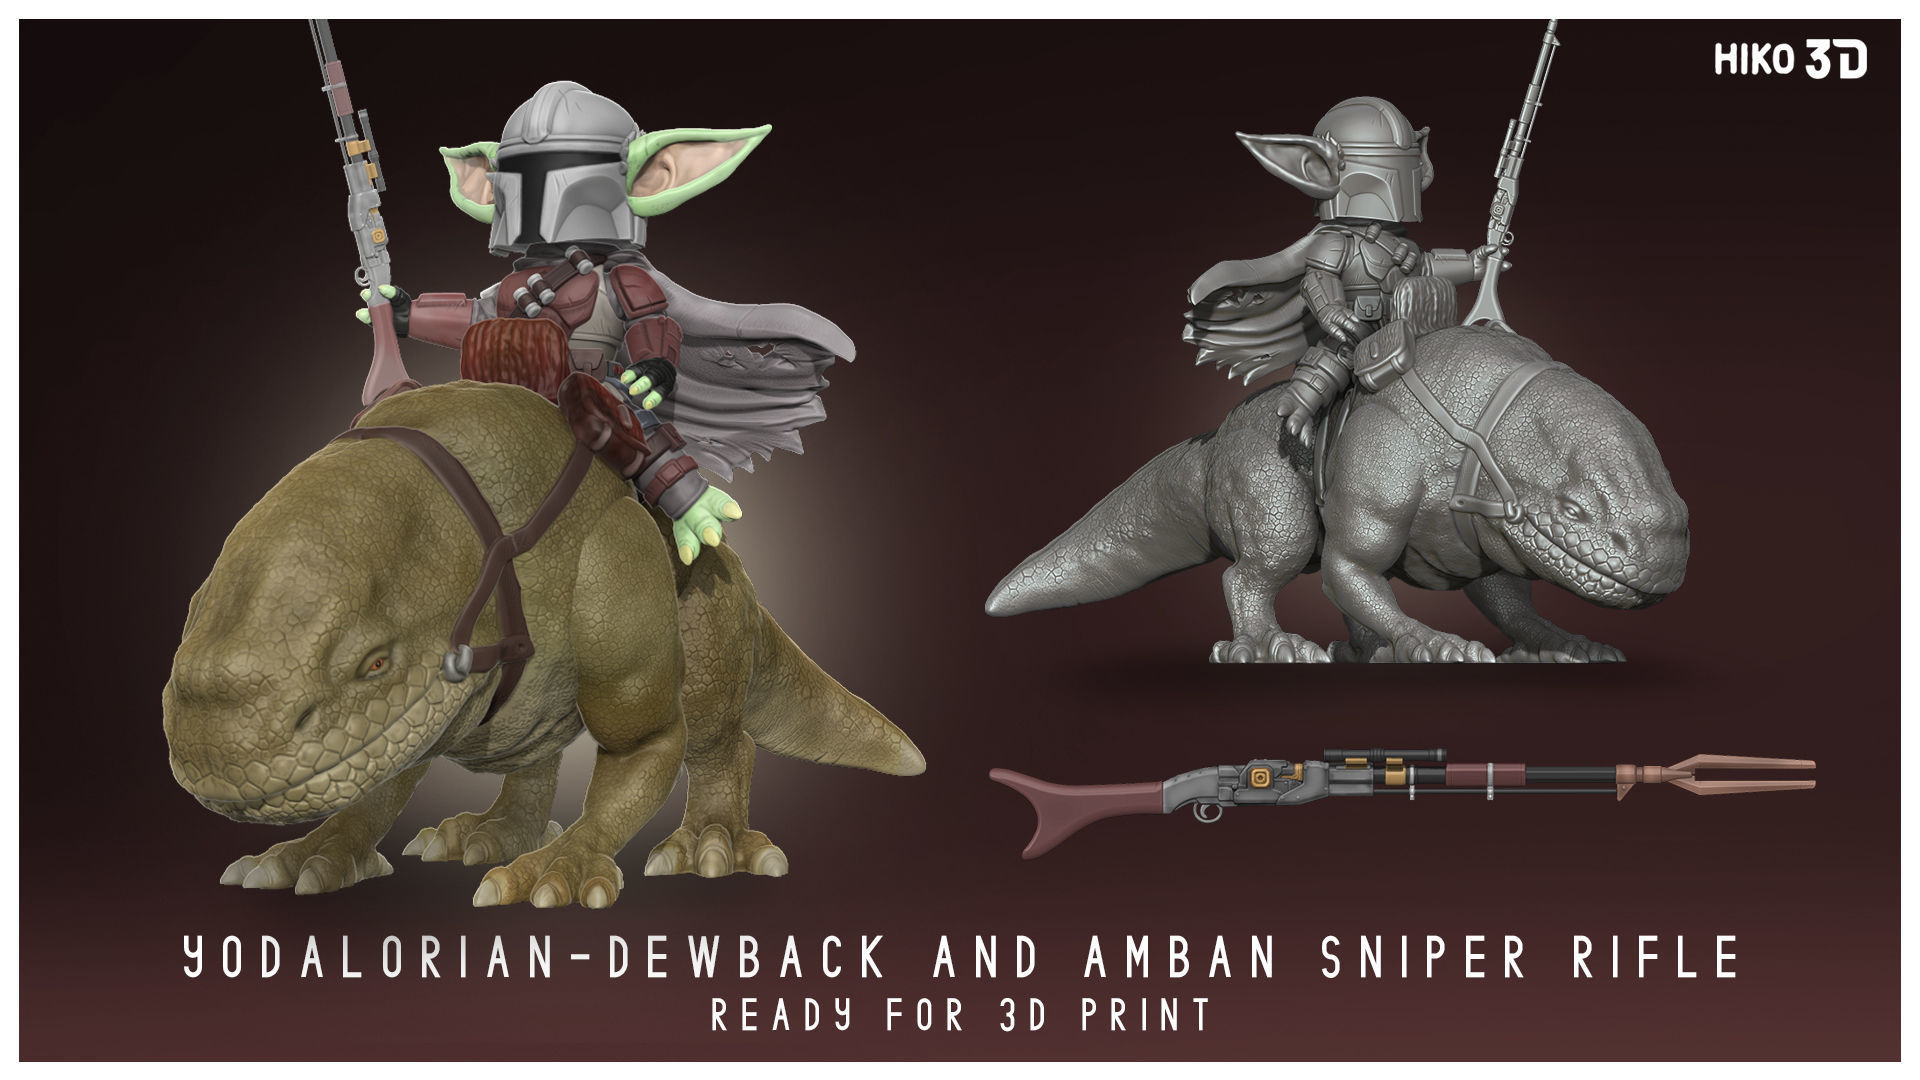 Yodalorian - Dewback - Child Mandalorian Baby Yoda 3D FanArt -